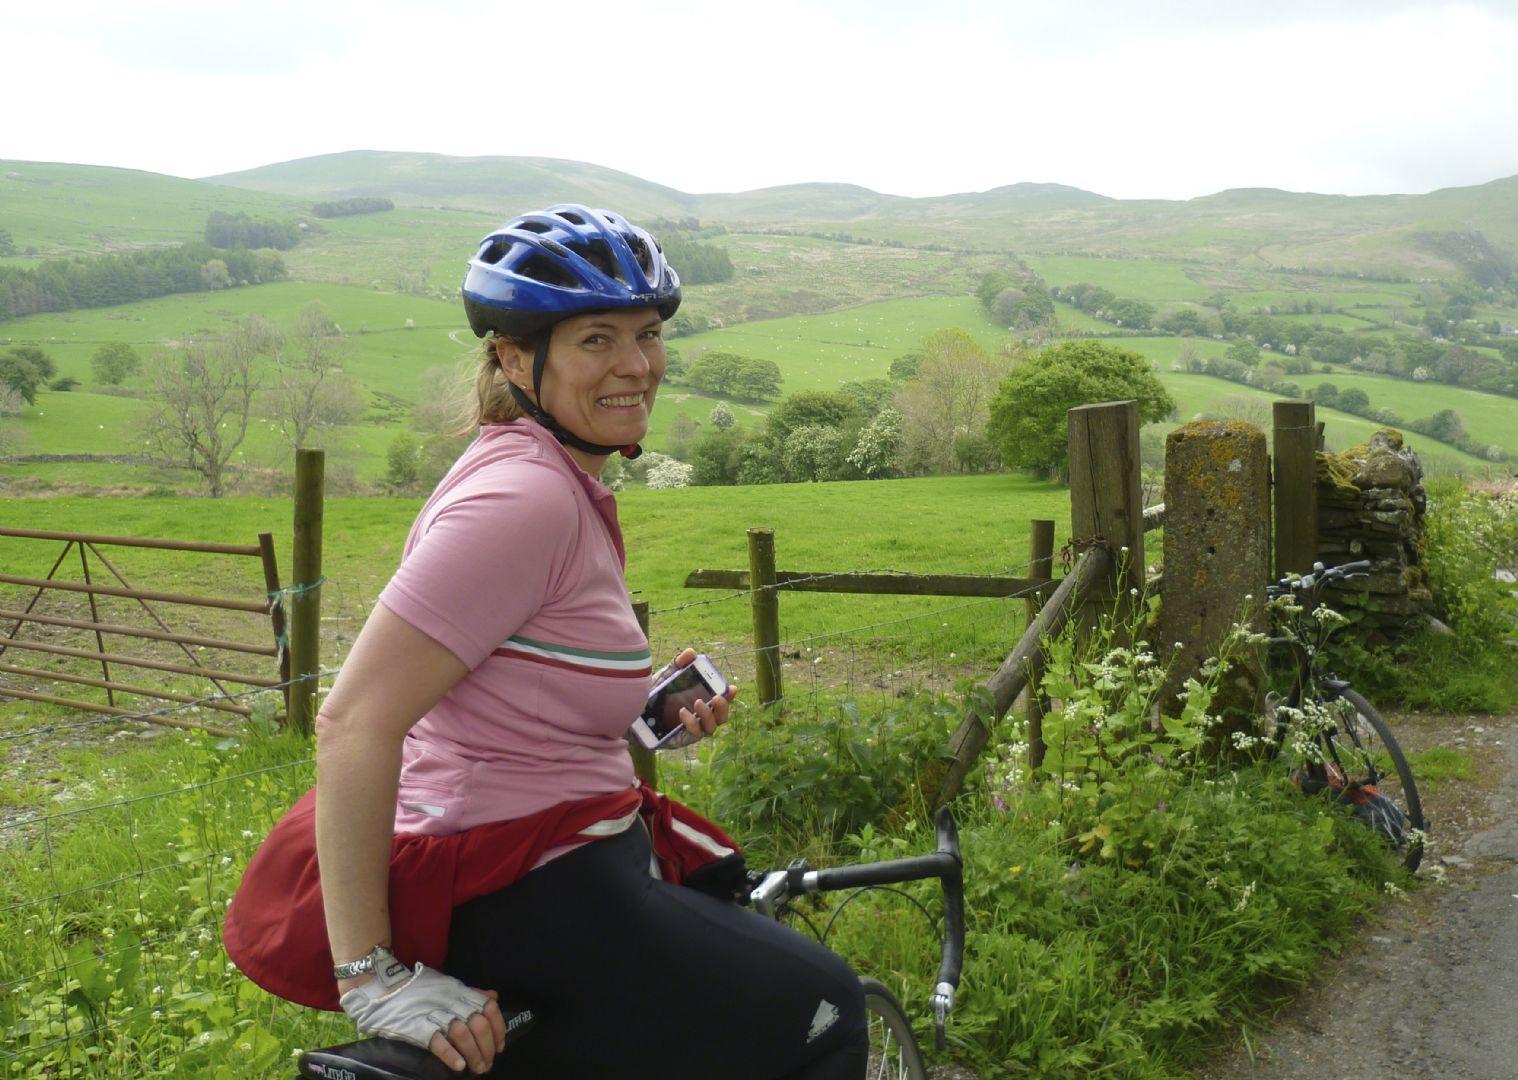 P1020368.jpg - UK - C2C - Coast to Coast 4 Days Cycling - Self-Guided Leisure Cycling Holiday - Leisure Cycling